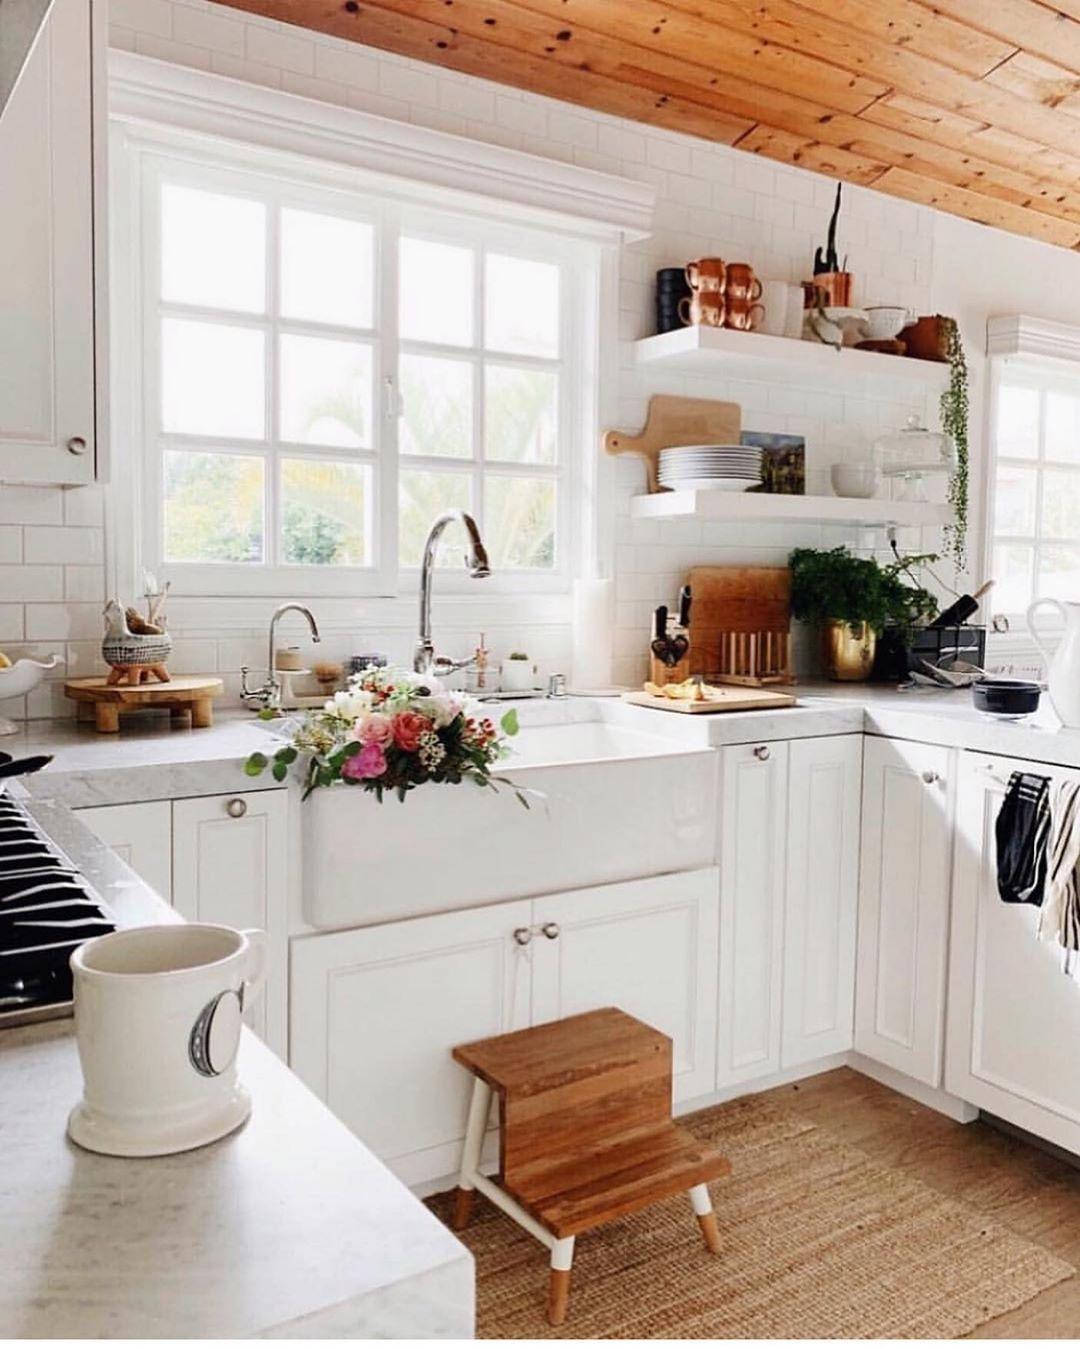 pretty little interior on instagram the perfect farmhouse chic kitchen via christinajwarren on farmhouse kitchen small id=81753